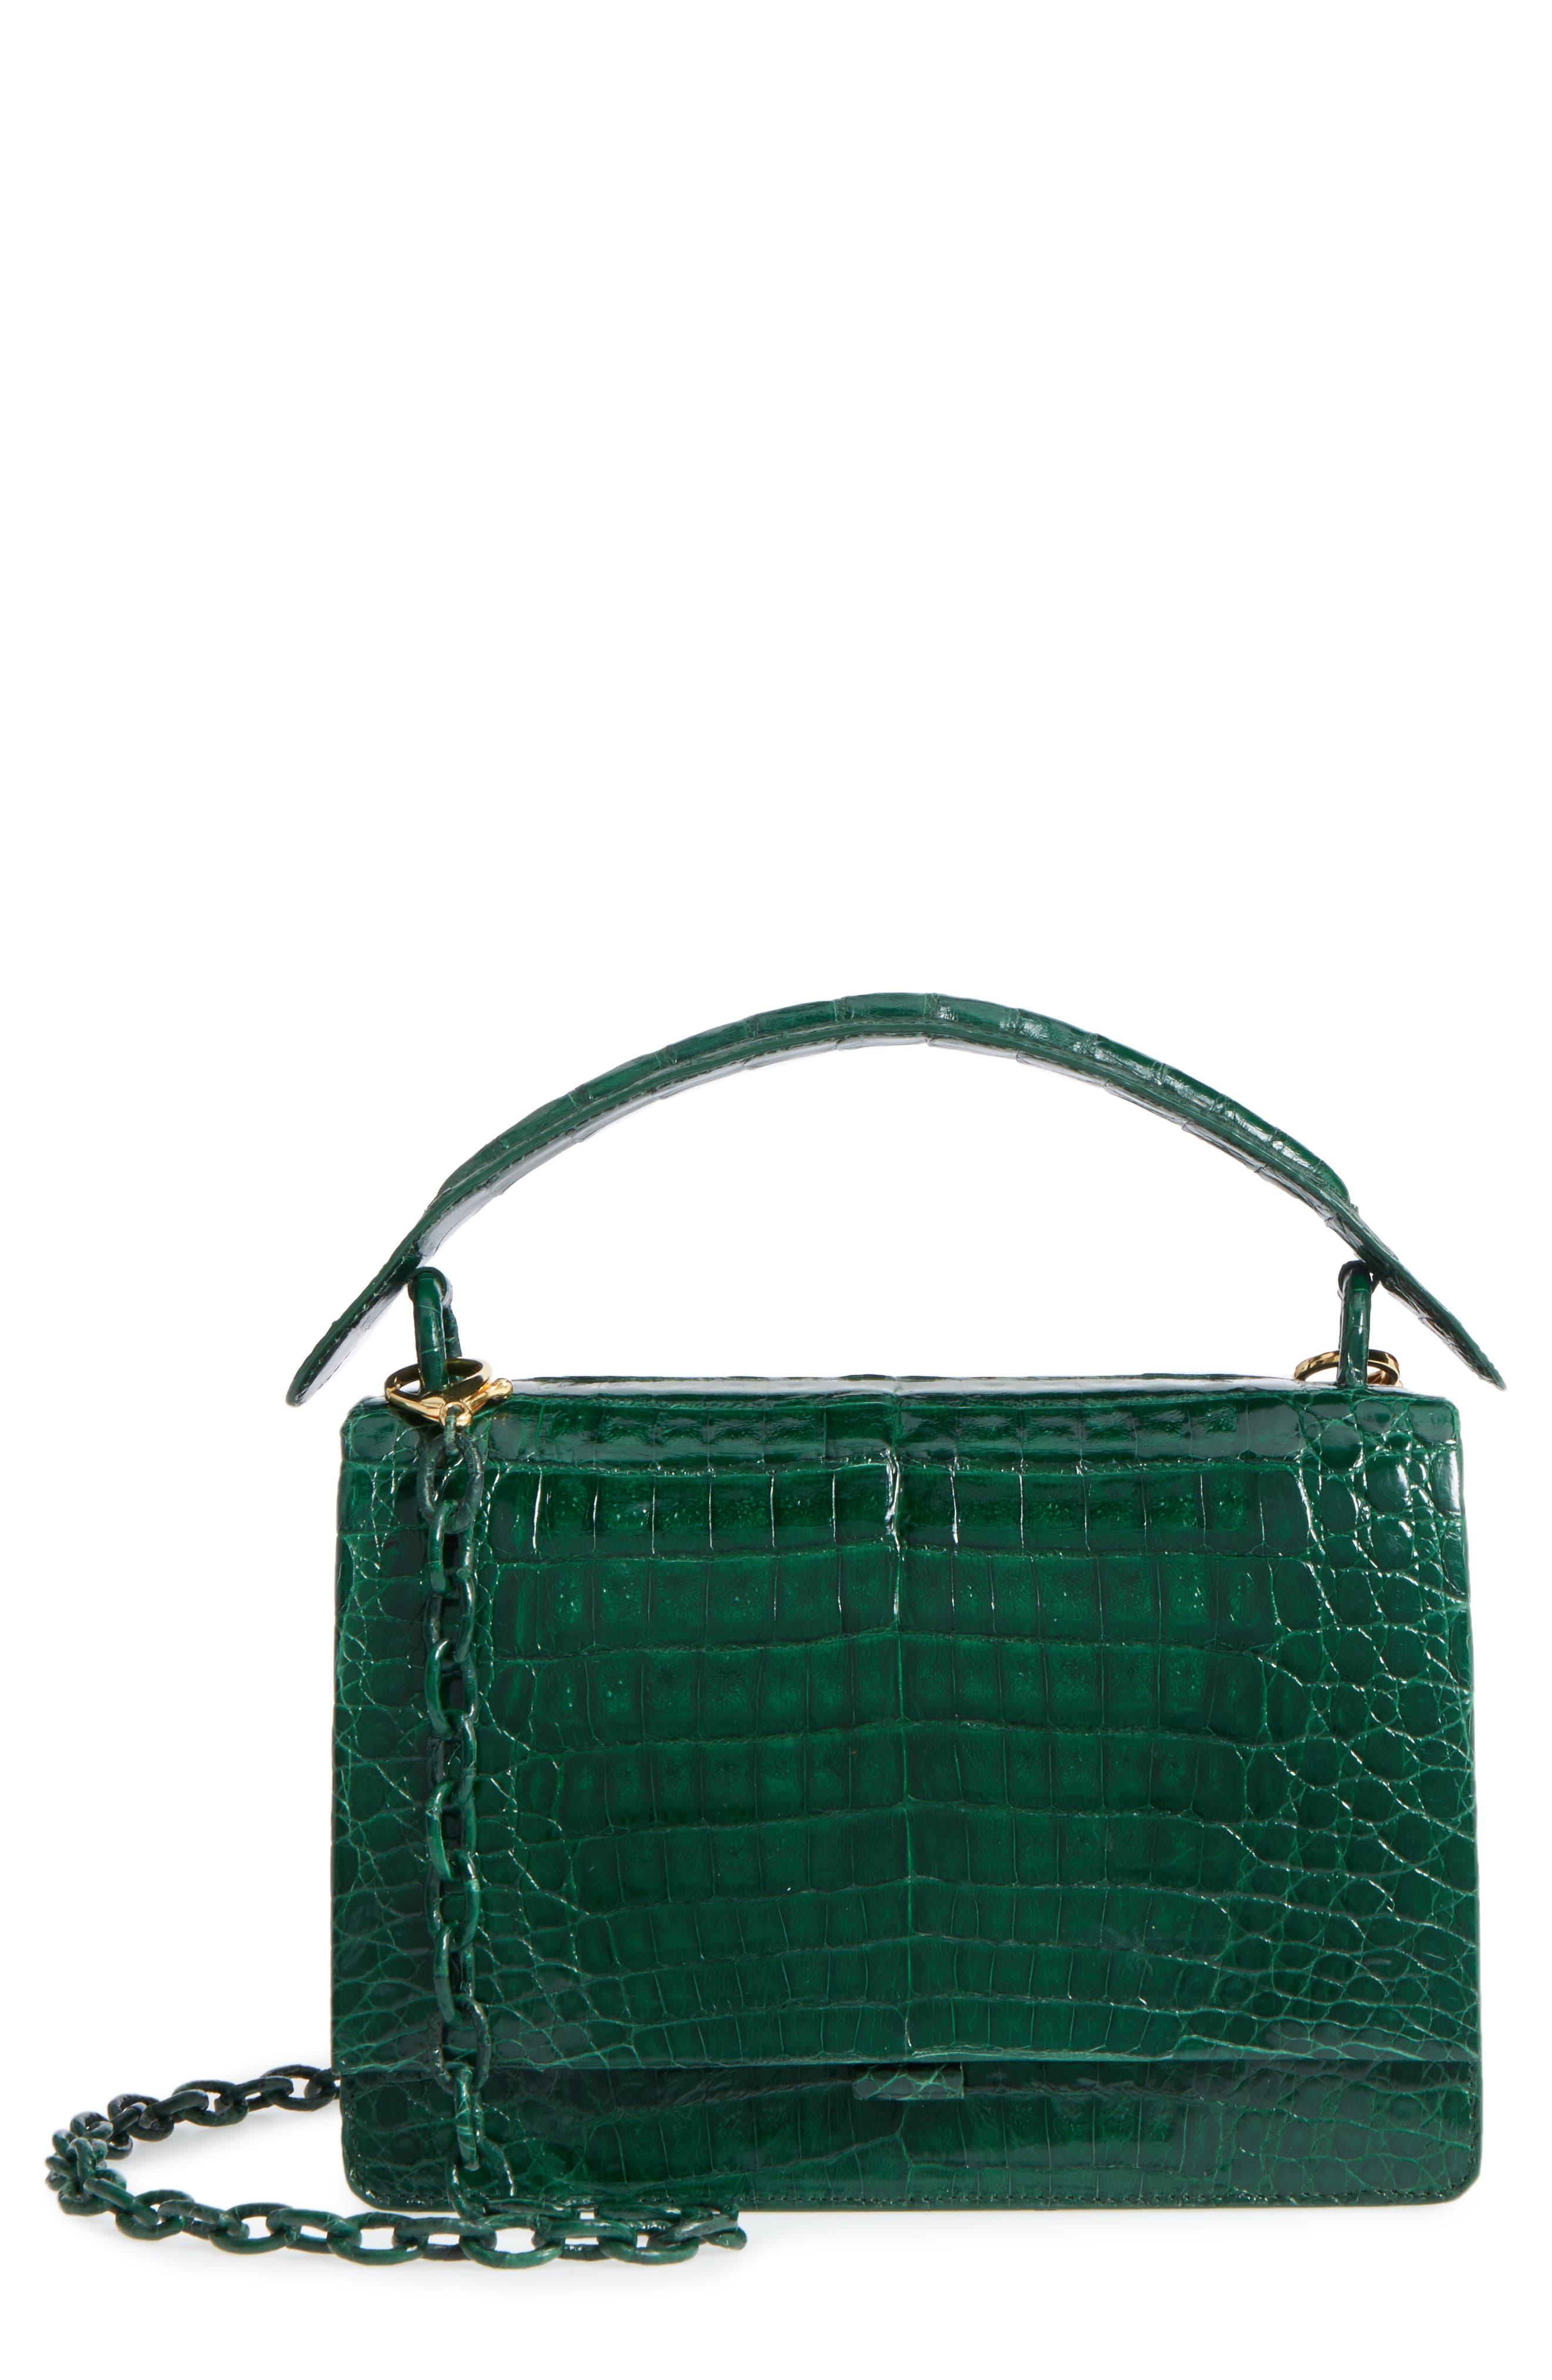 Divino Genuine Crocodile Top Handle Bag,                             Main thumbnail 1, color,                             KELLY GREEN SHINY